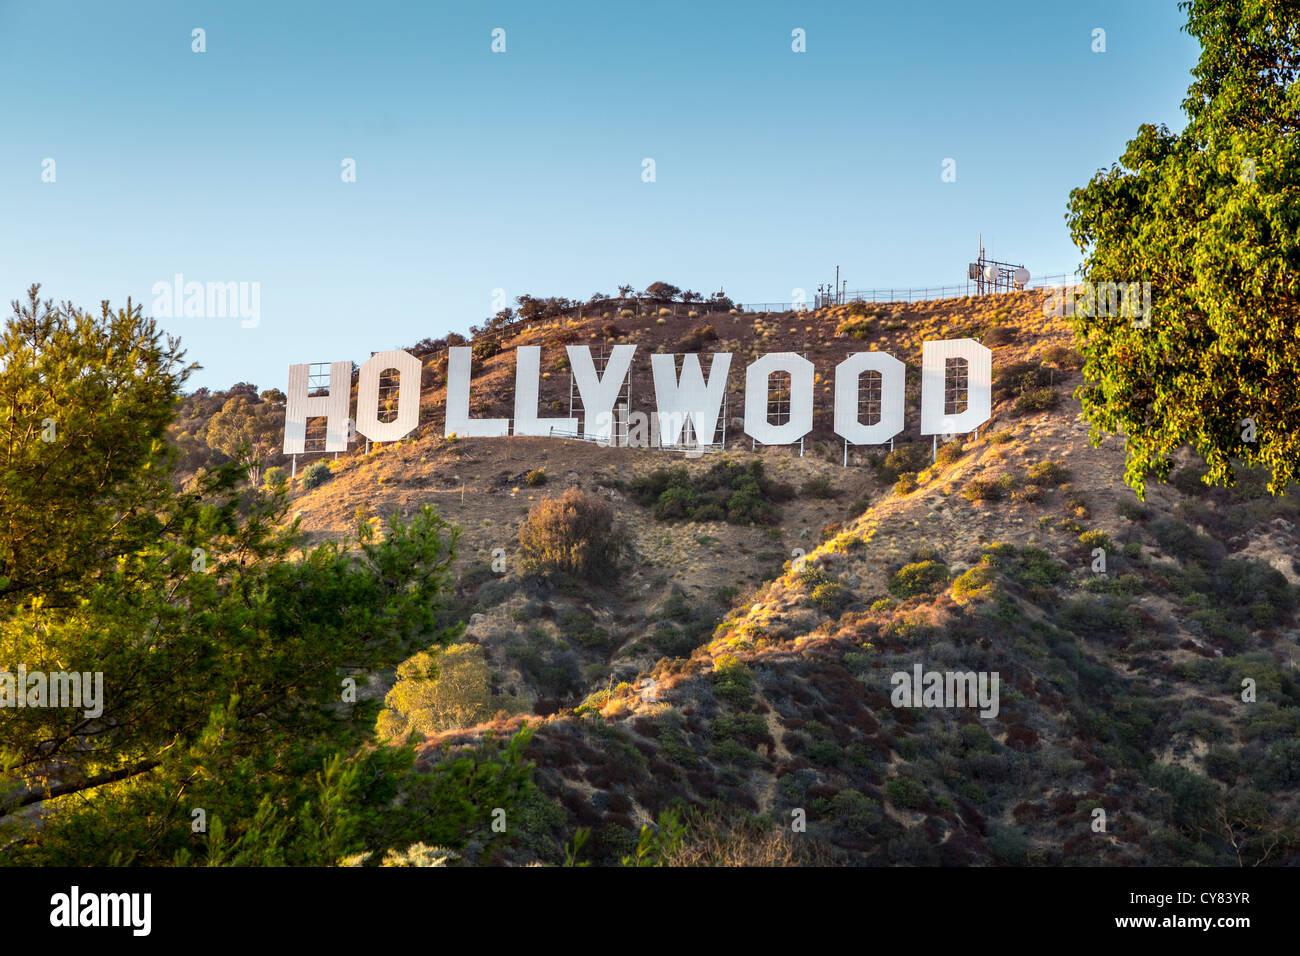 HOLLYWOOD Kalifornien - 24 SEPTEMBER: Die Welt berühmtes Wahrzeichen Hollywood-Schild am 24. September 2012 Stockbild